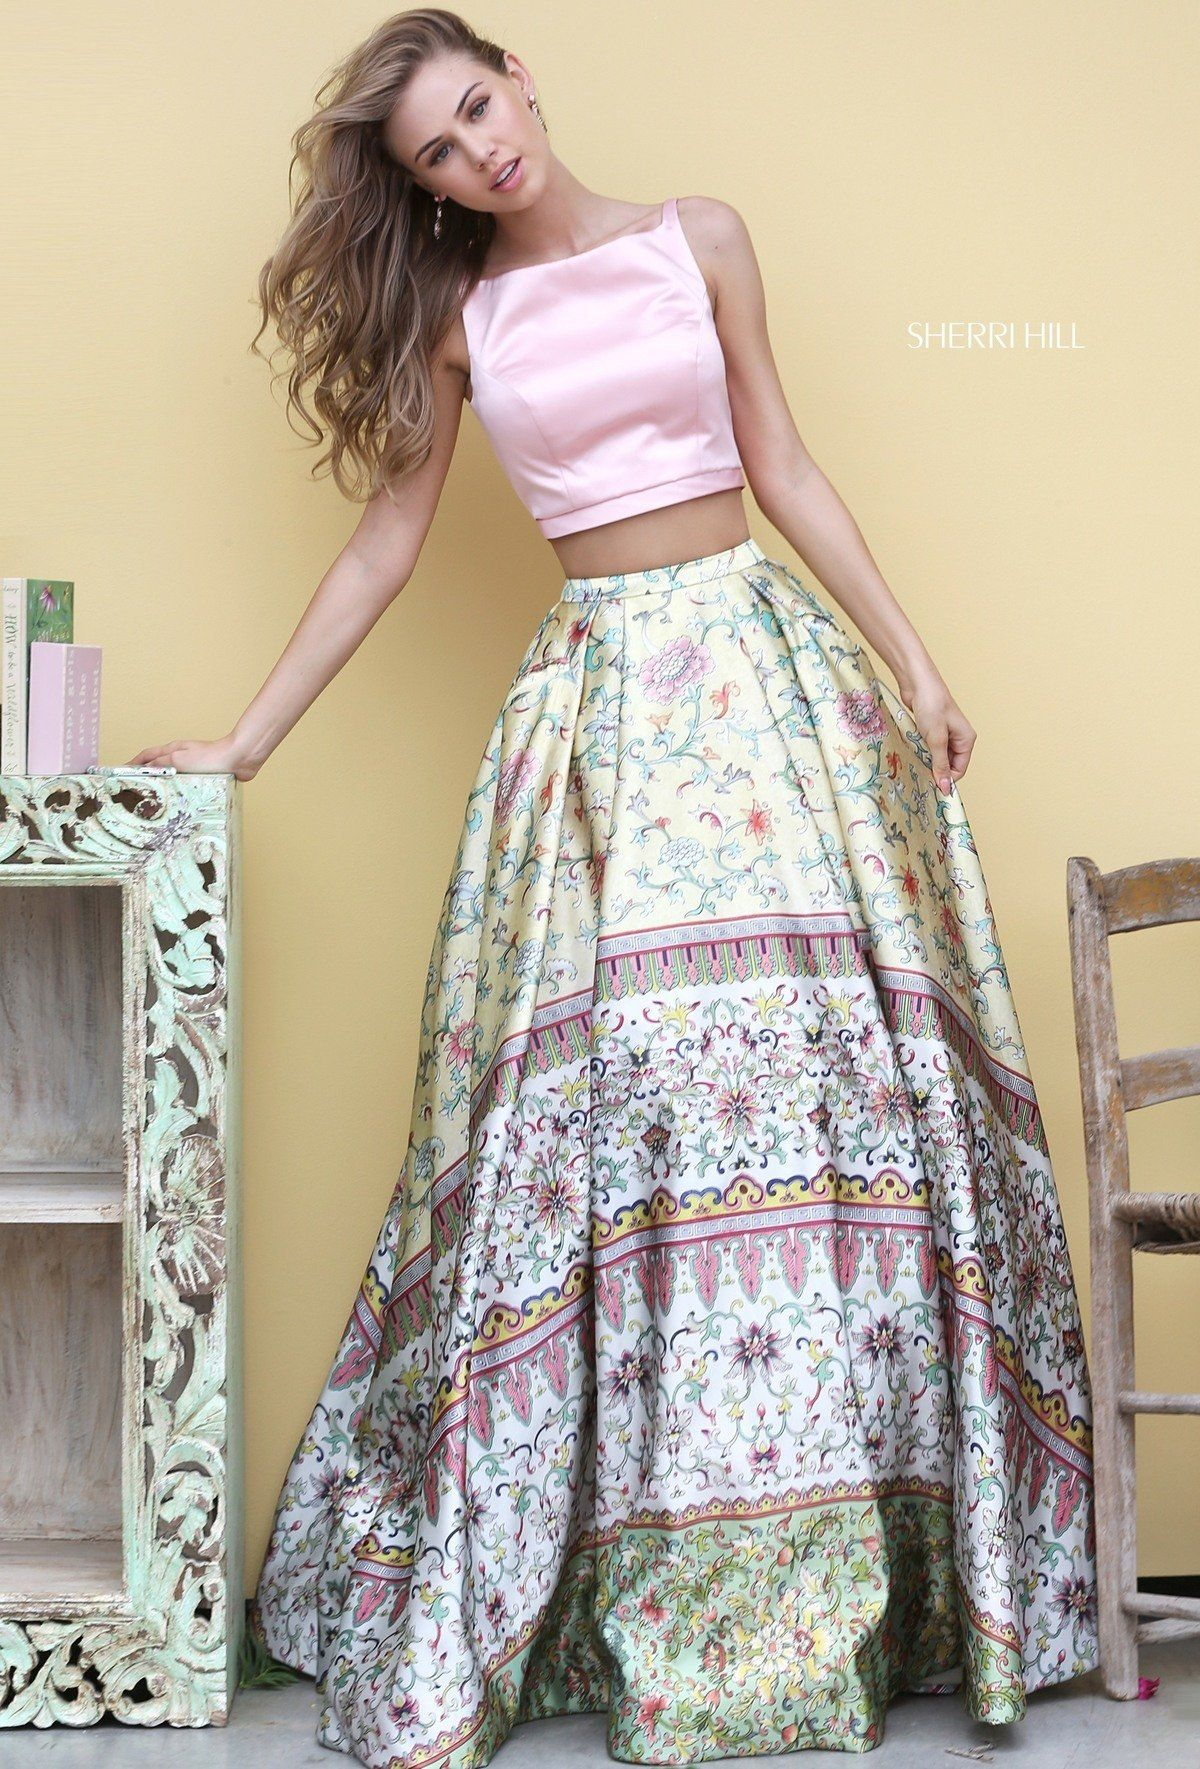 Sherri hill style stuff to try in pinterest dresses